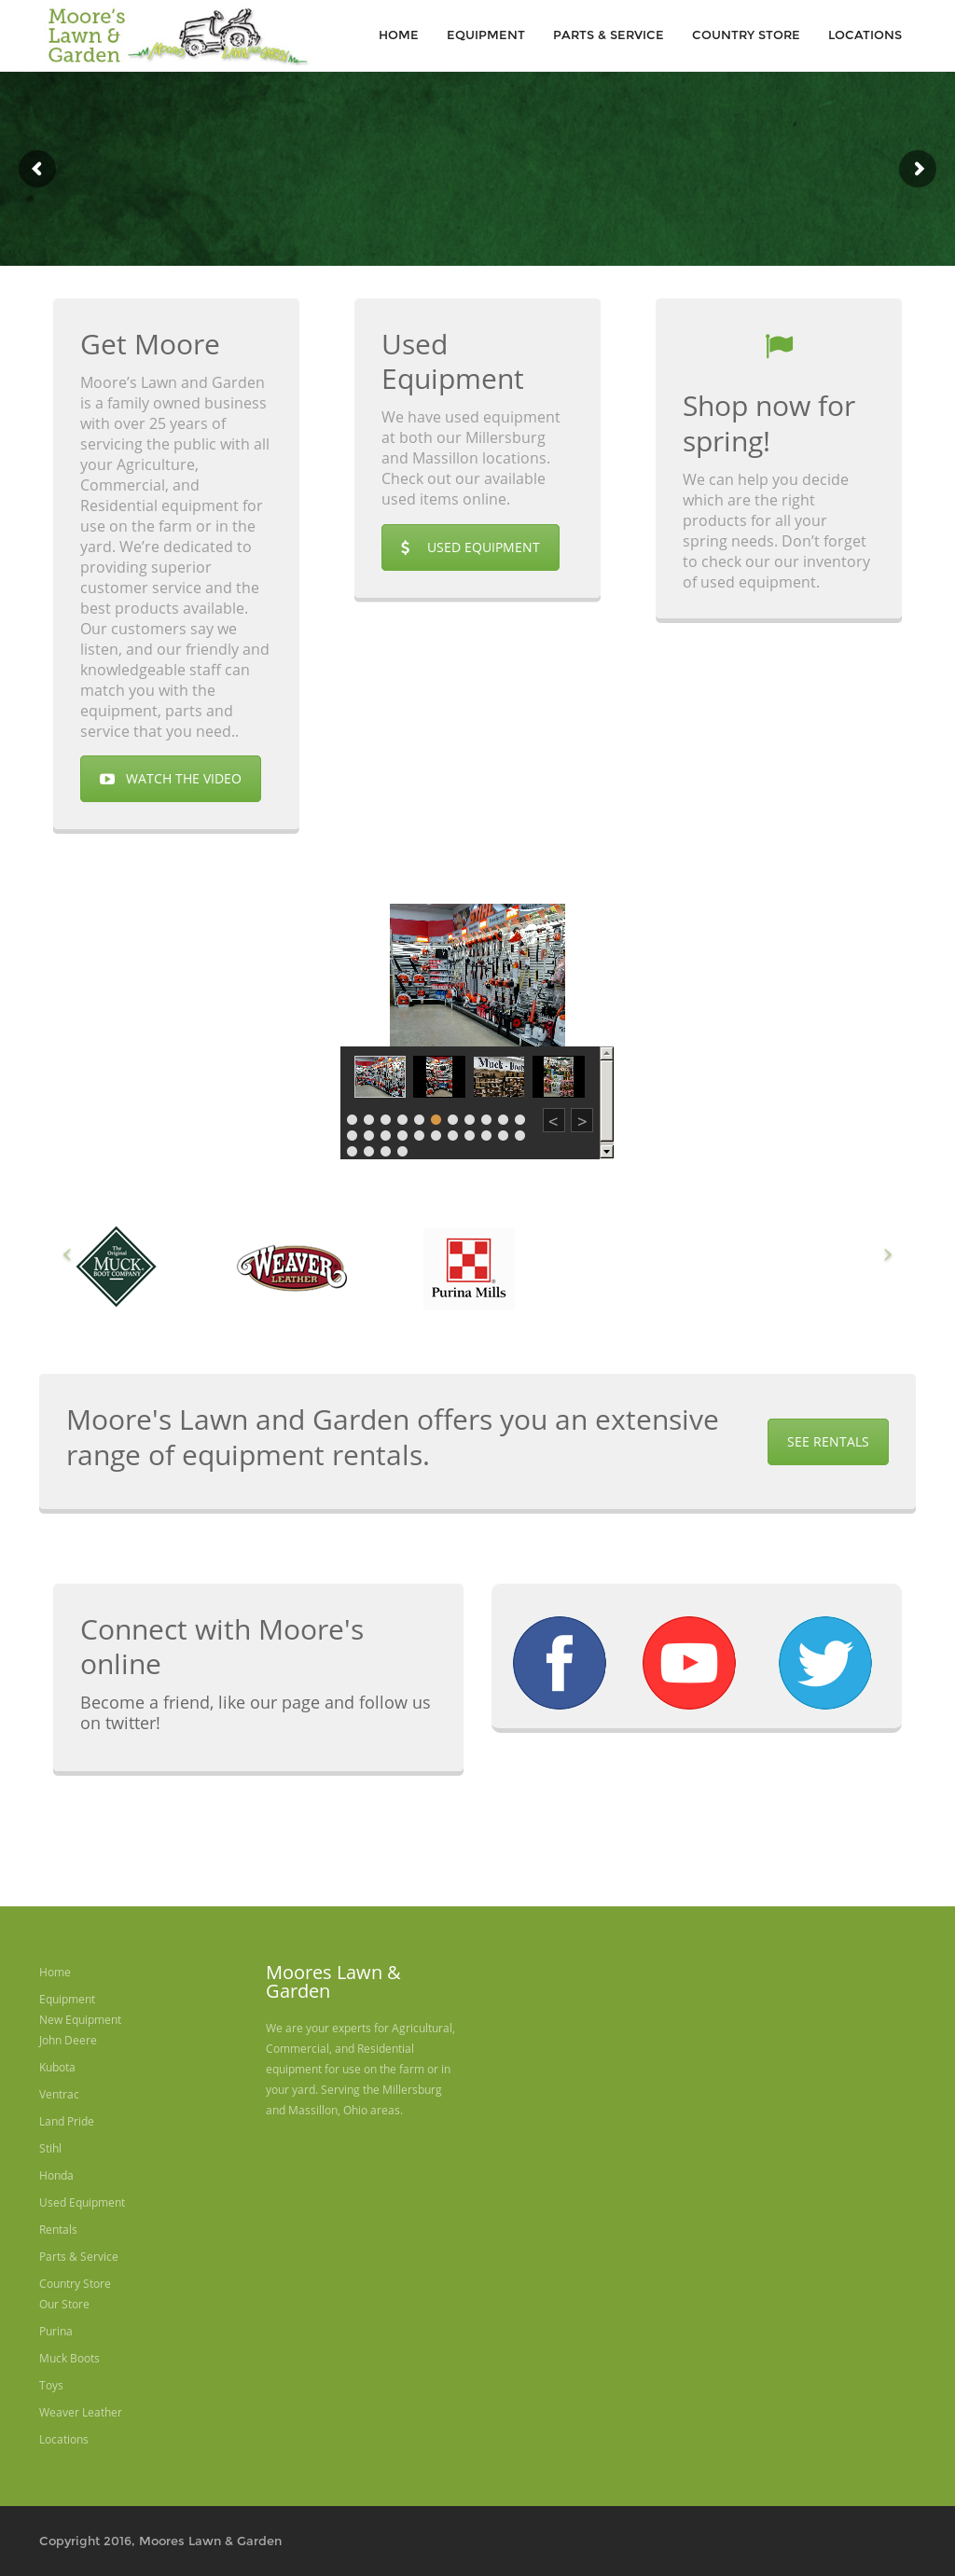 Mooreu0027s Lawn U0026 Garden Competitors, Revenue And Employees   Owler Company  Profile